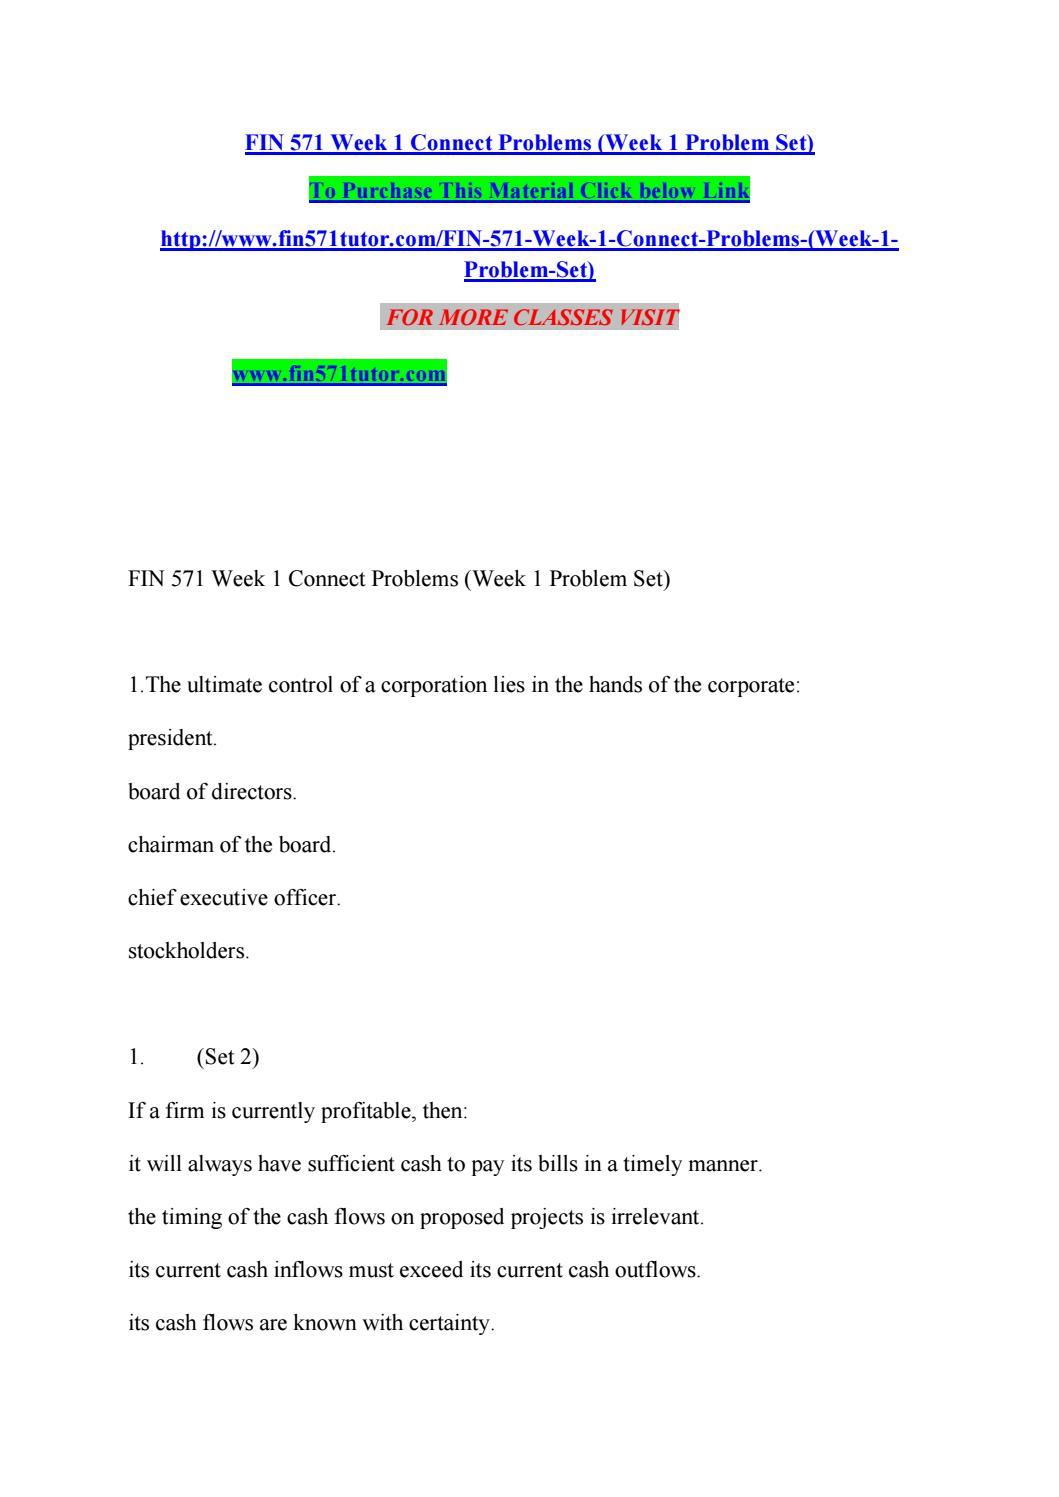 FIN 571 Week 2 Individual Text Problem Sets